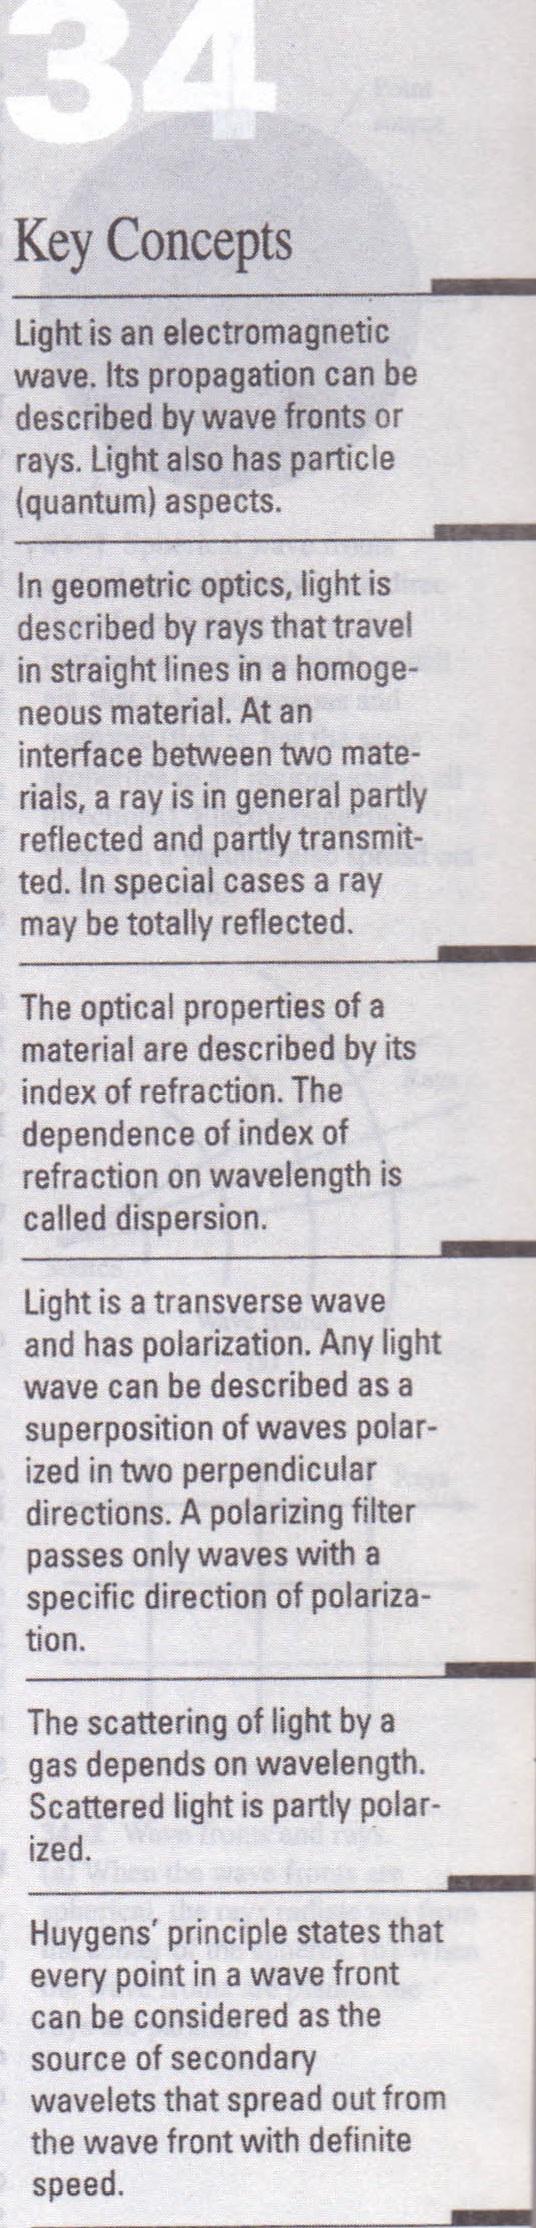 HOMEWORK ANSWERS  Light and Geometric Optics